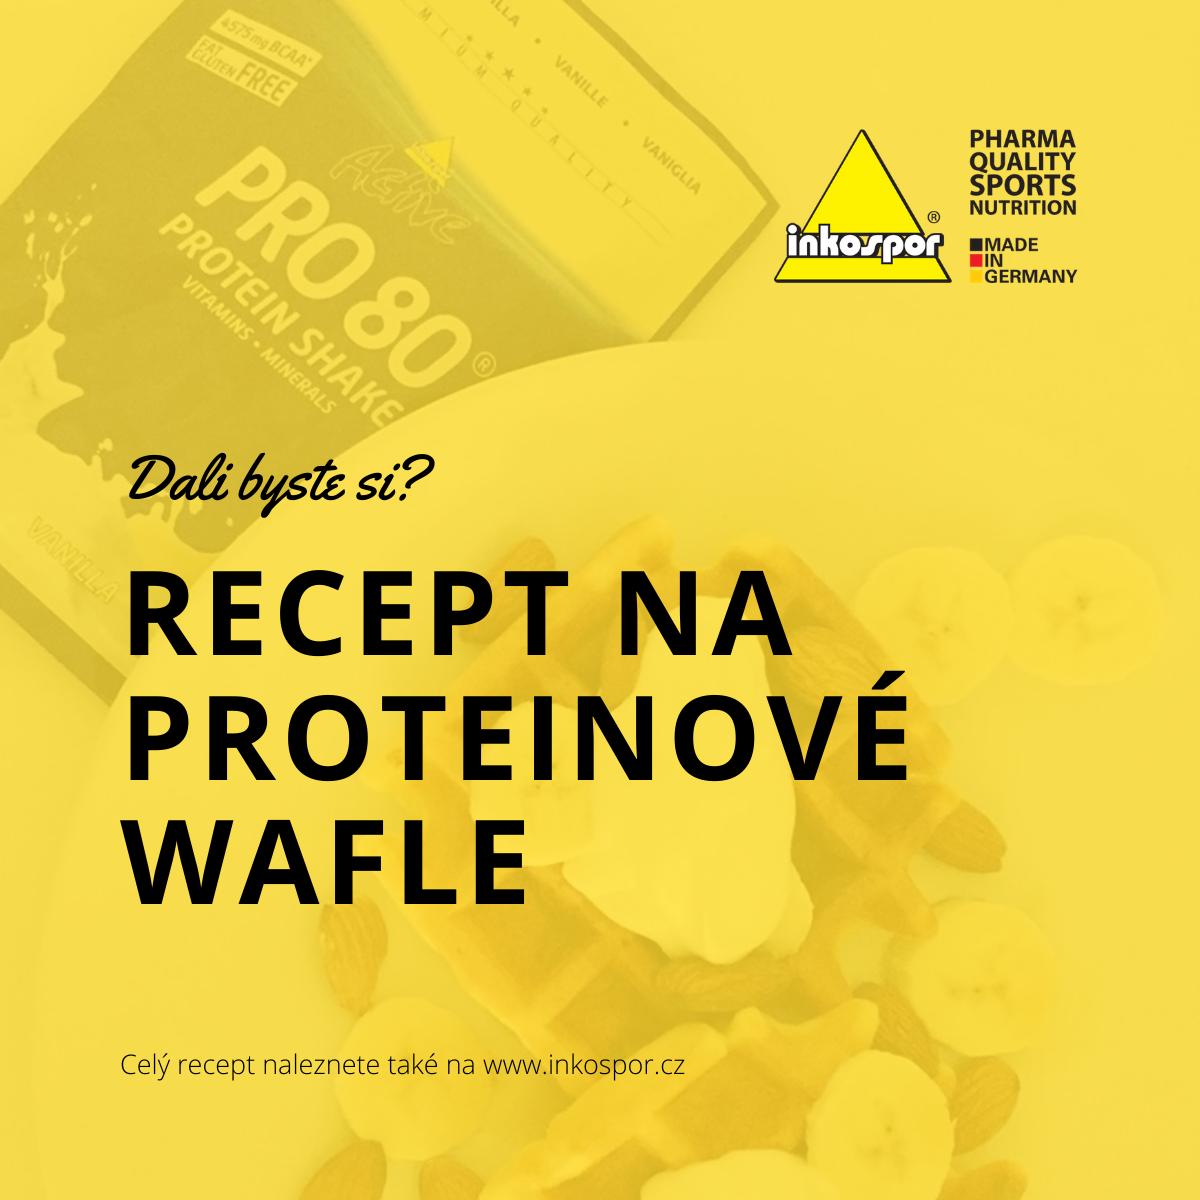 Recept | Proteinové wafle